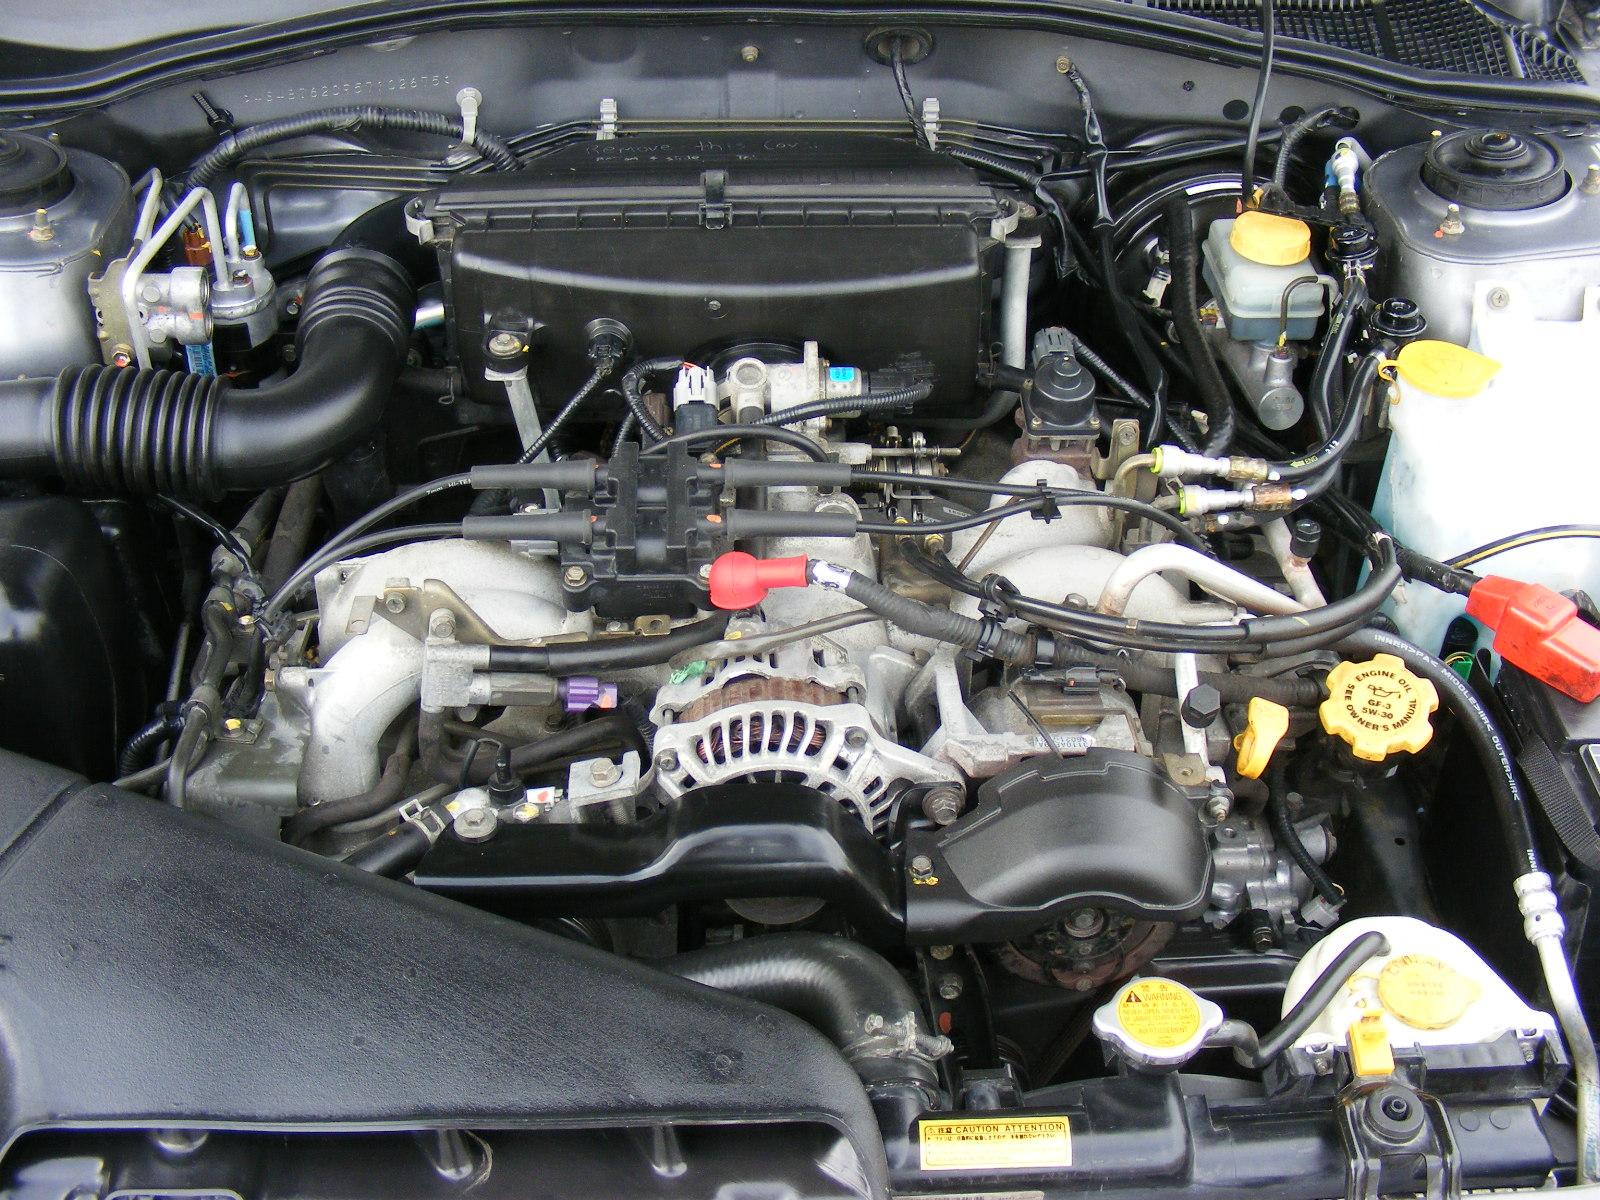 2005 Subaru Baja - Pictures